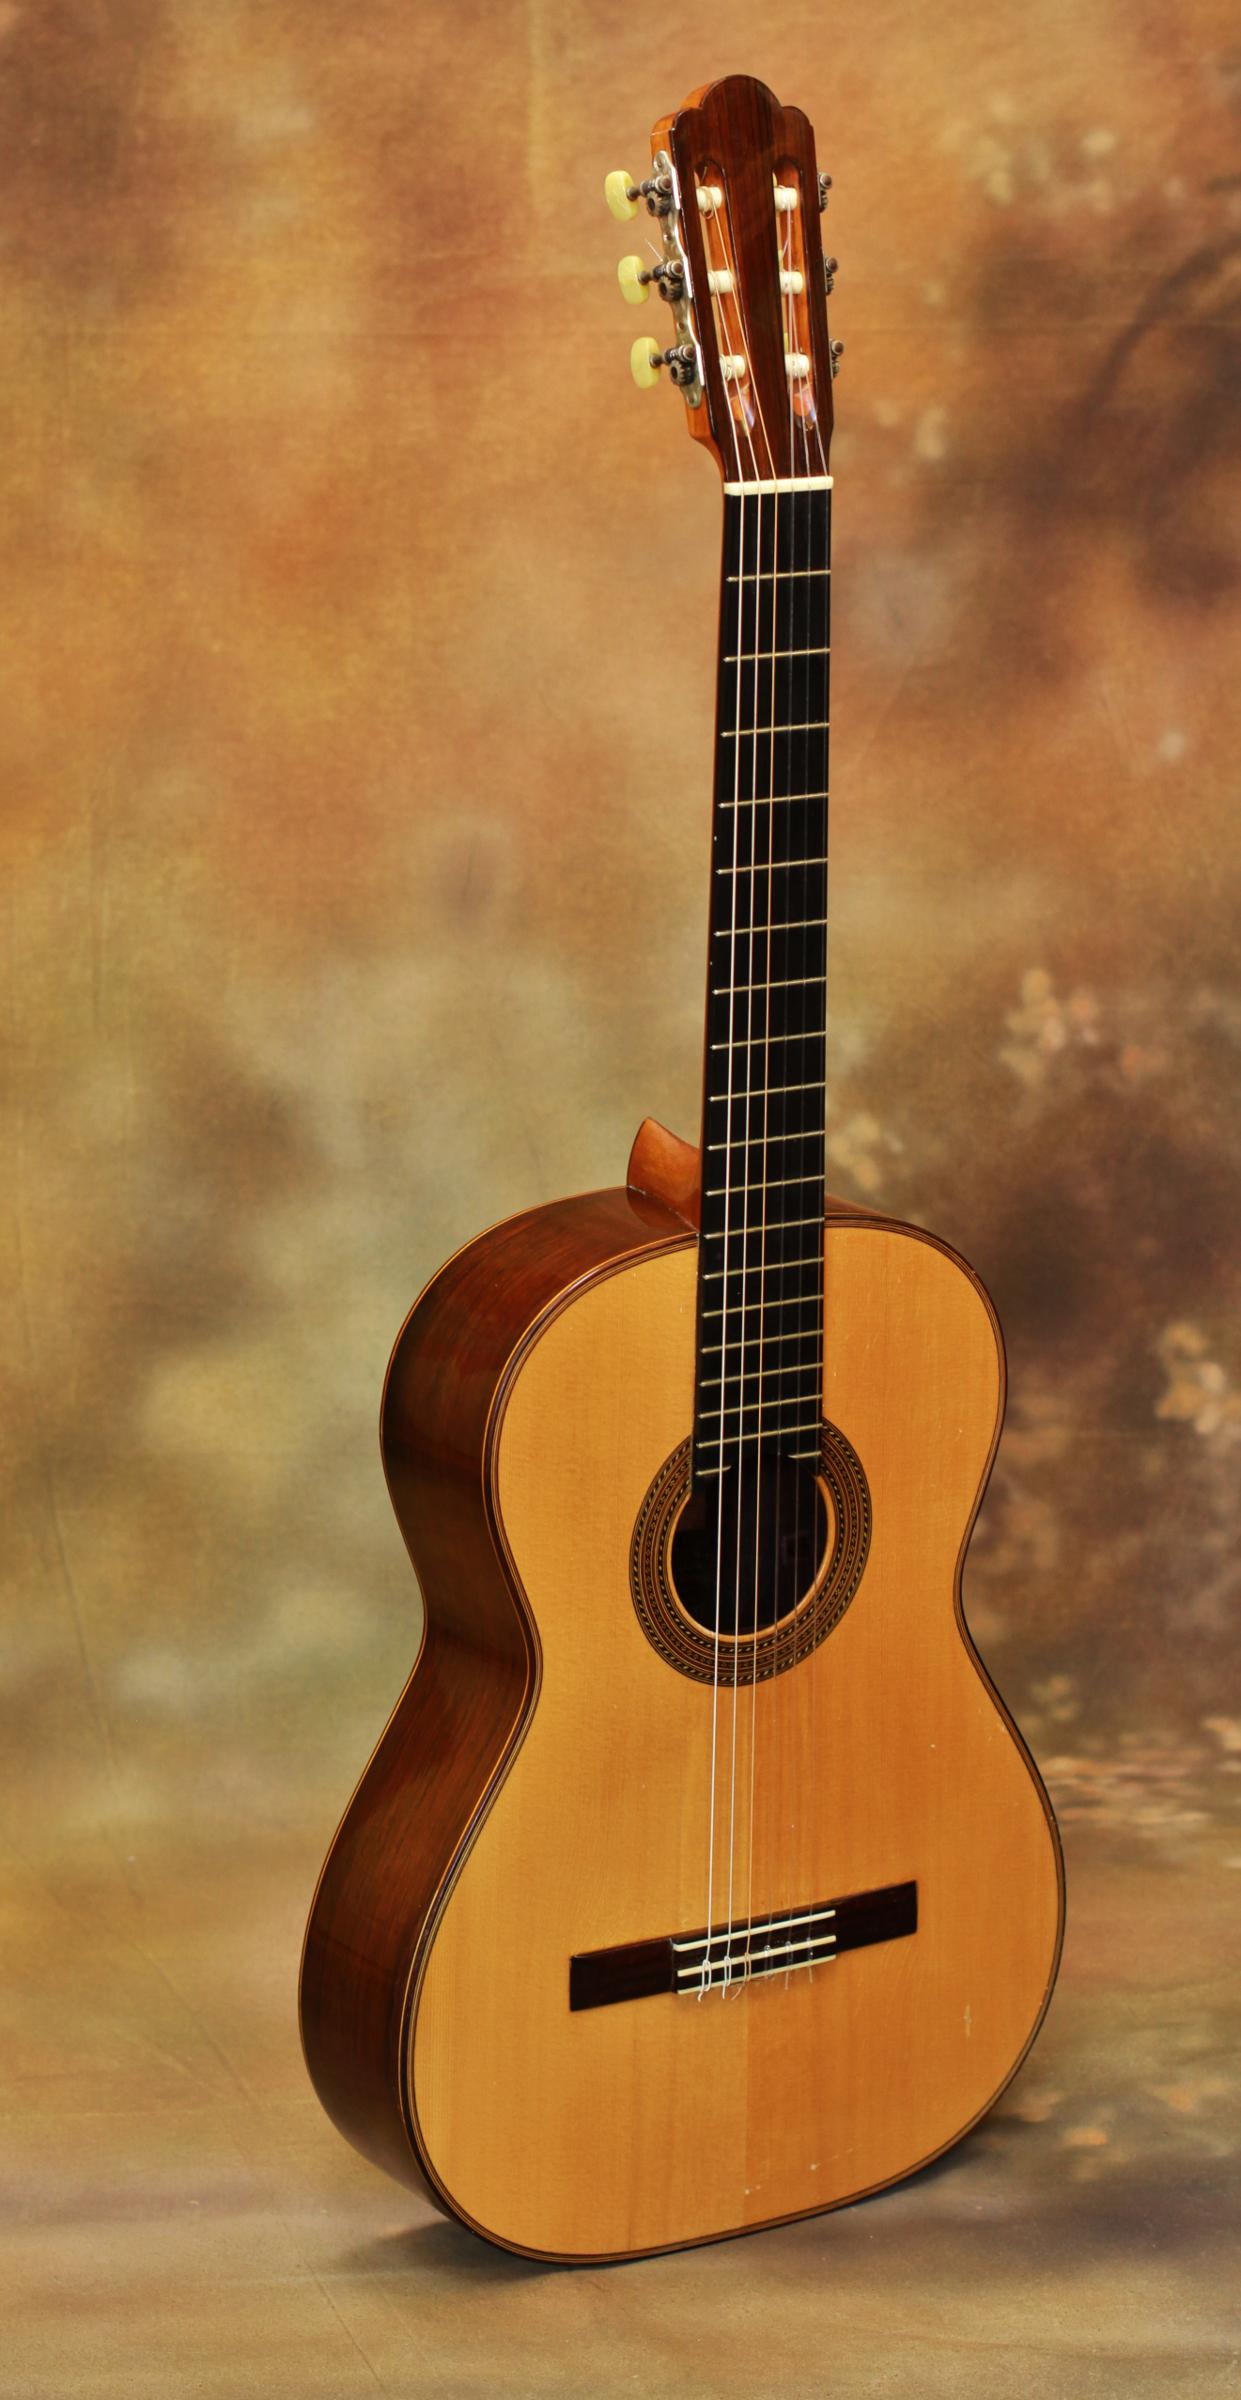 manuel velazquez 1964 savage classical guitar. Black Bedroom Furniture Sets. Home Design Ideas